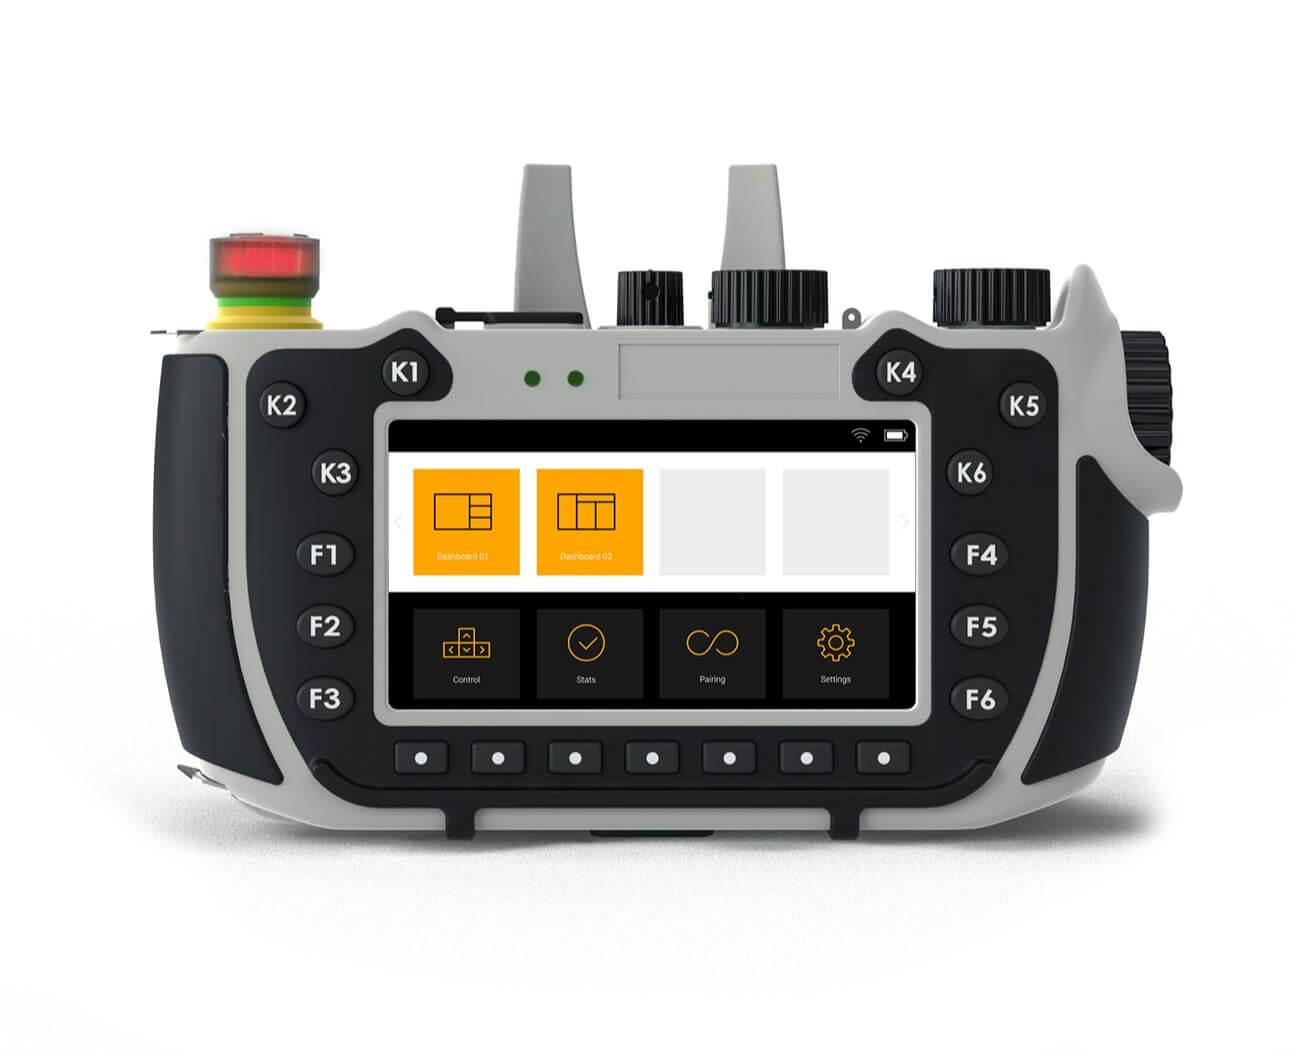 X5 Handheld